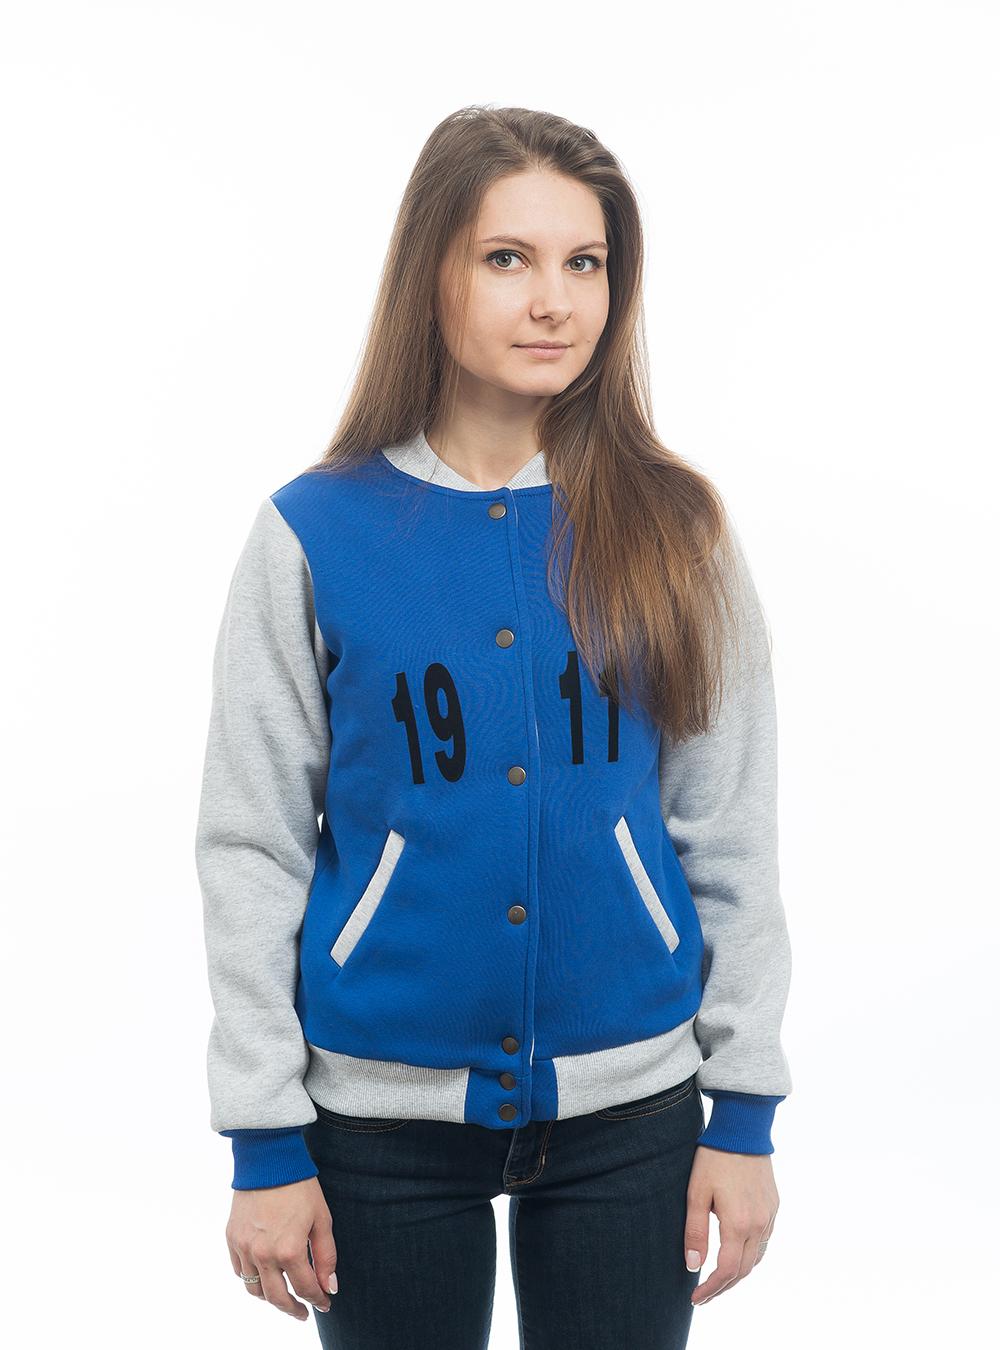 Купить Бомбер на кнопках «CSKAGIRL», цвет синий (S) по Нижнему Новгороду